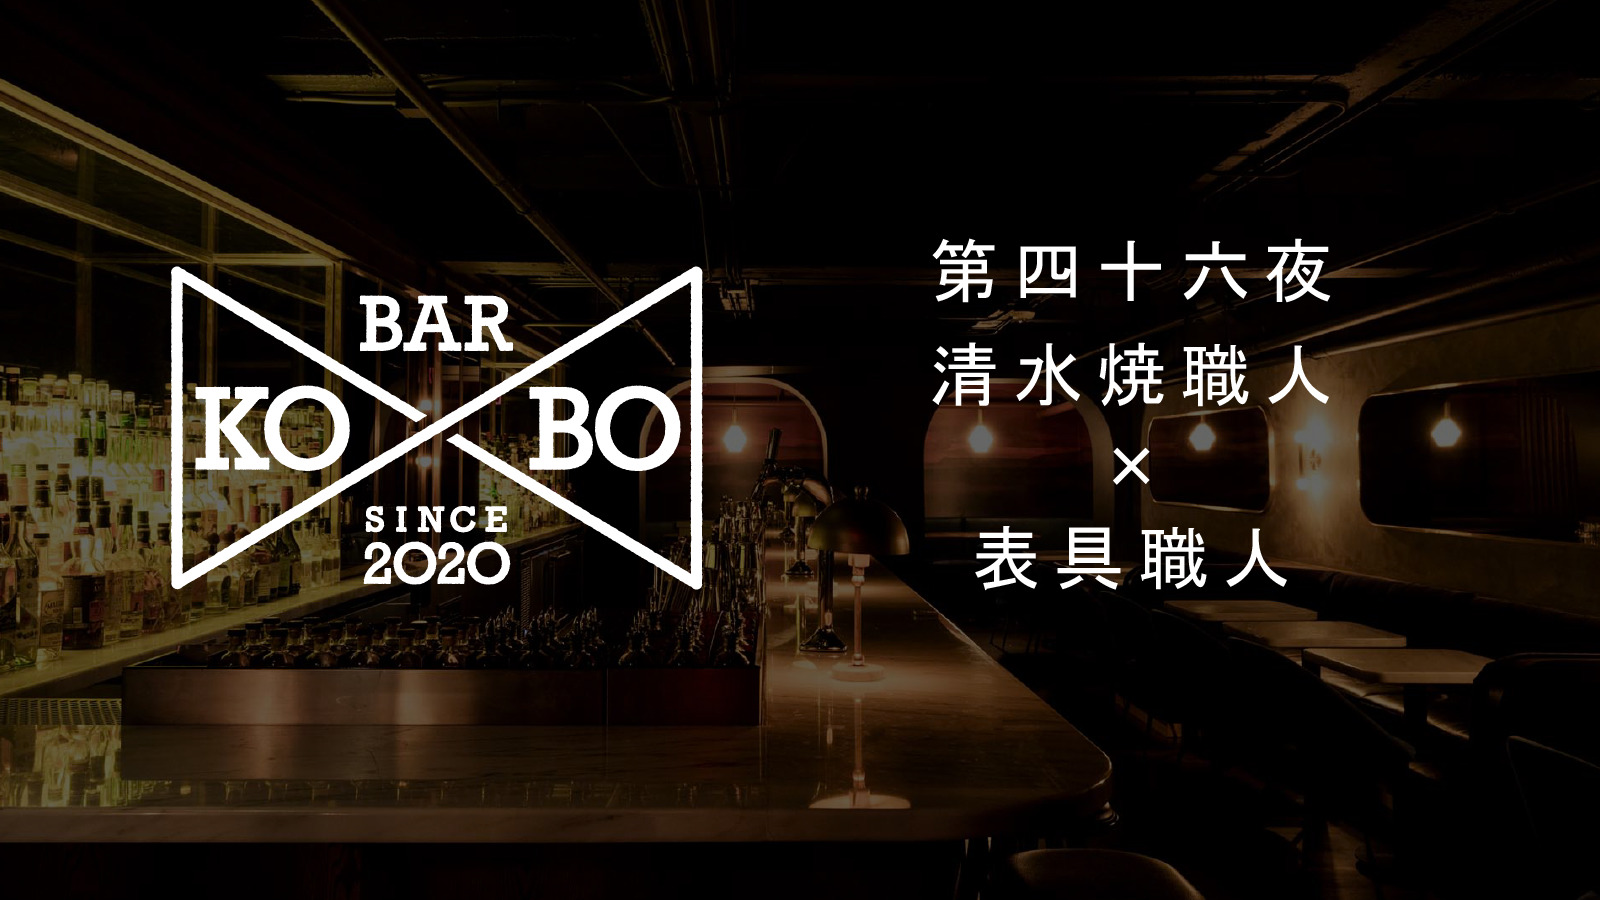 【Bar KO-BO 第四十六夜】清水焼職人×表具職人